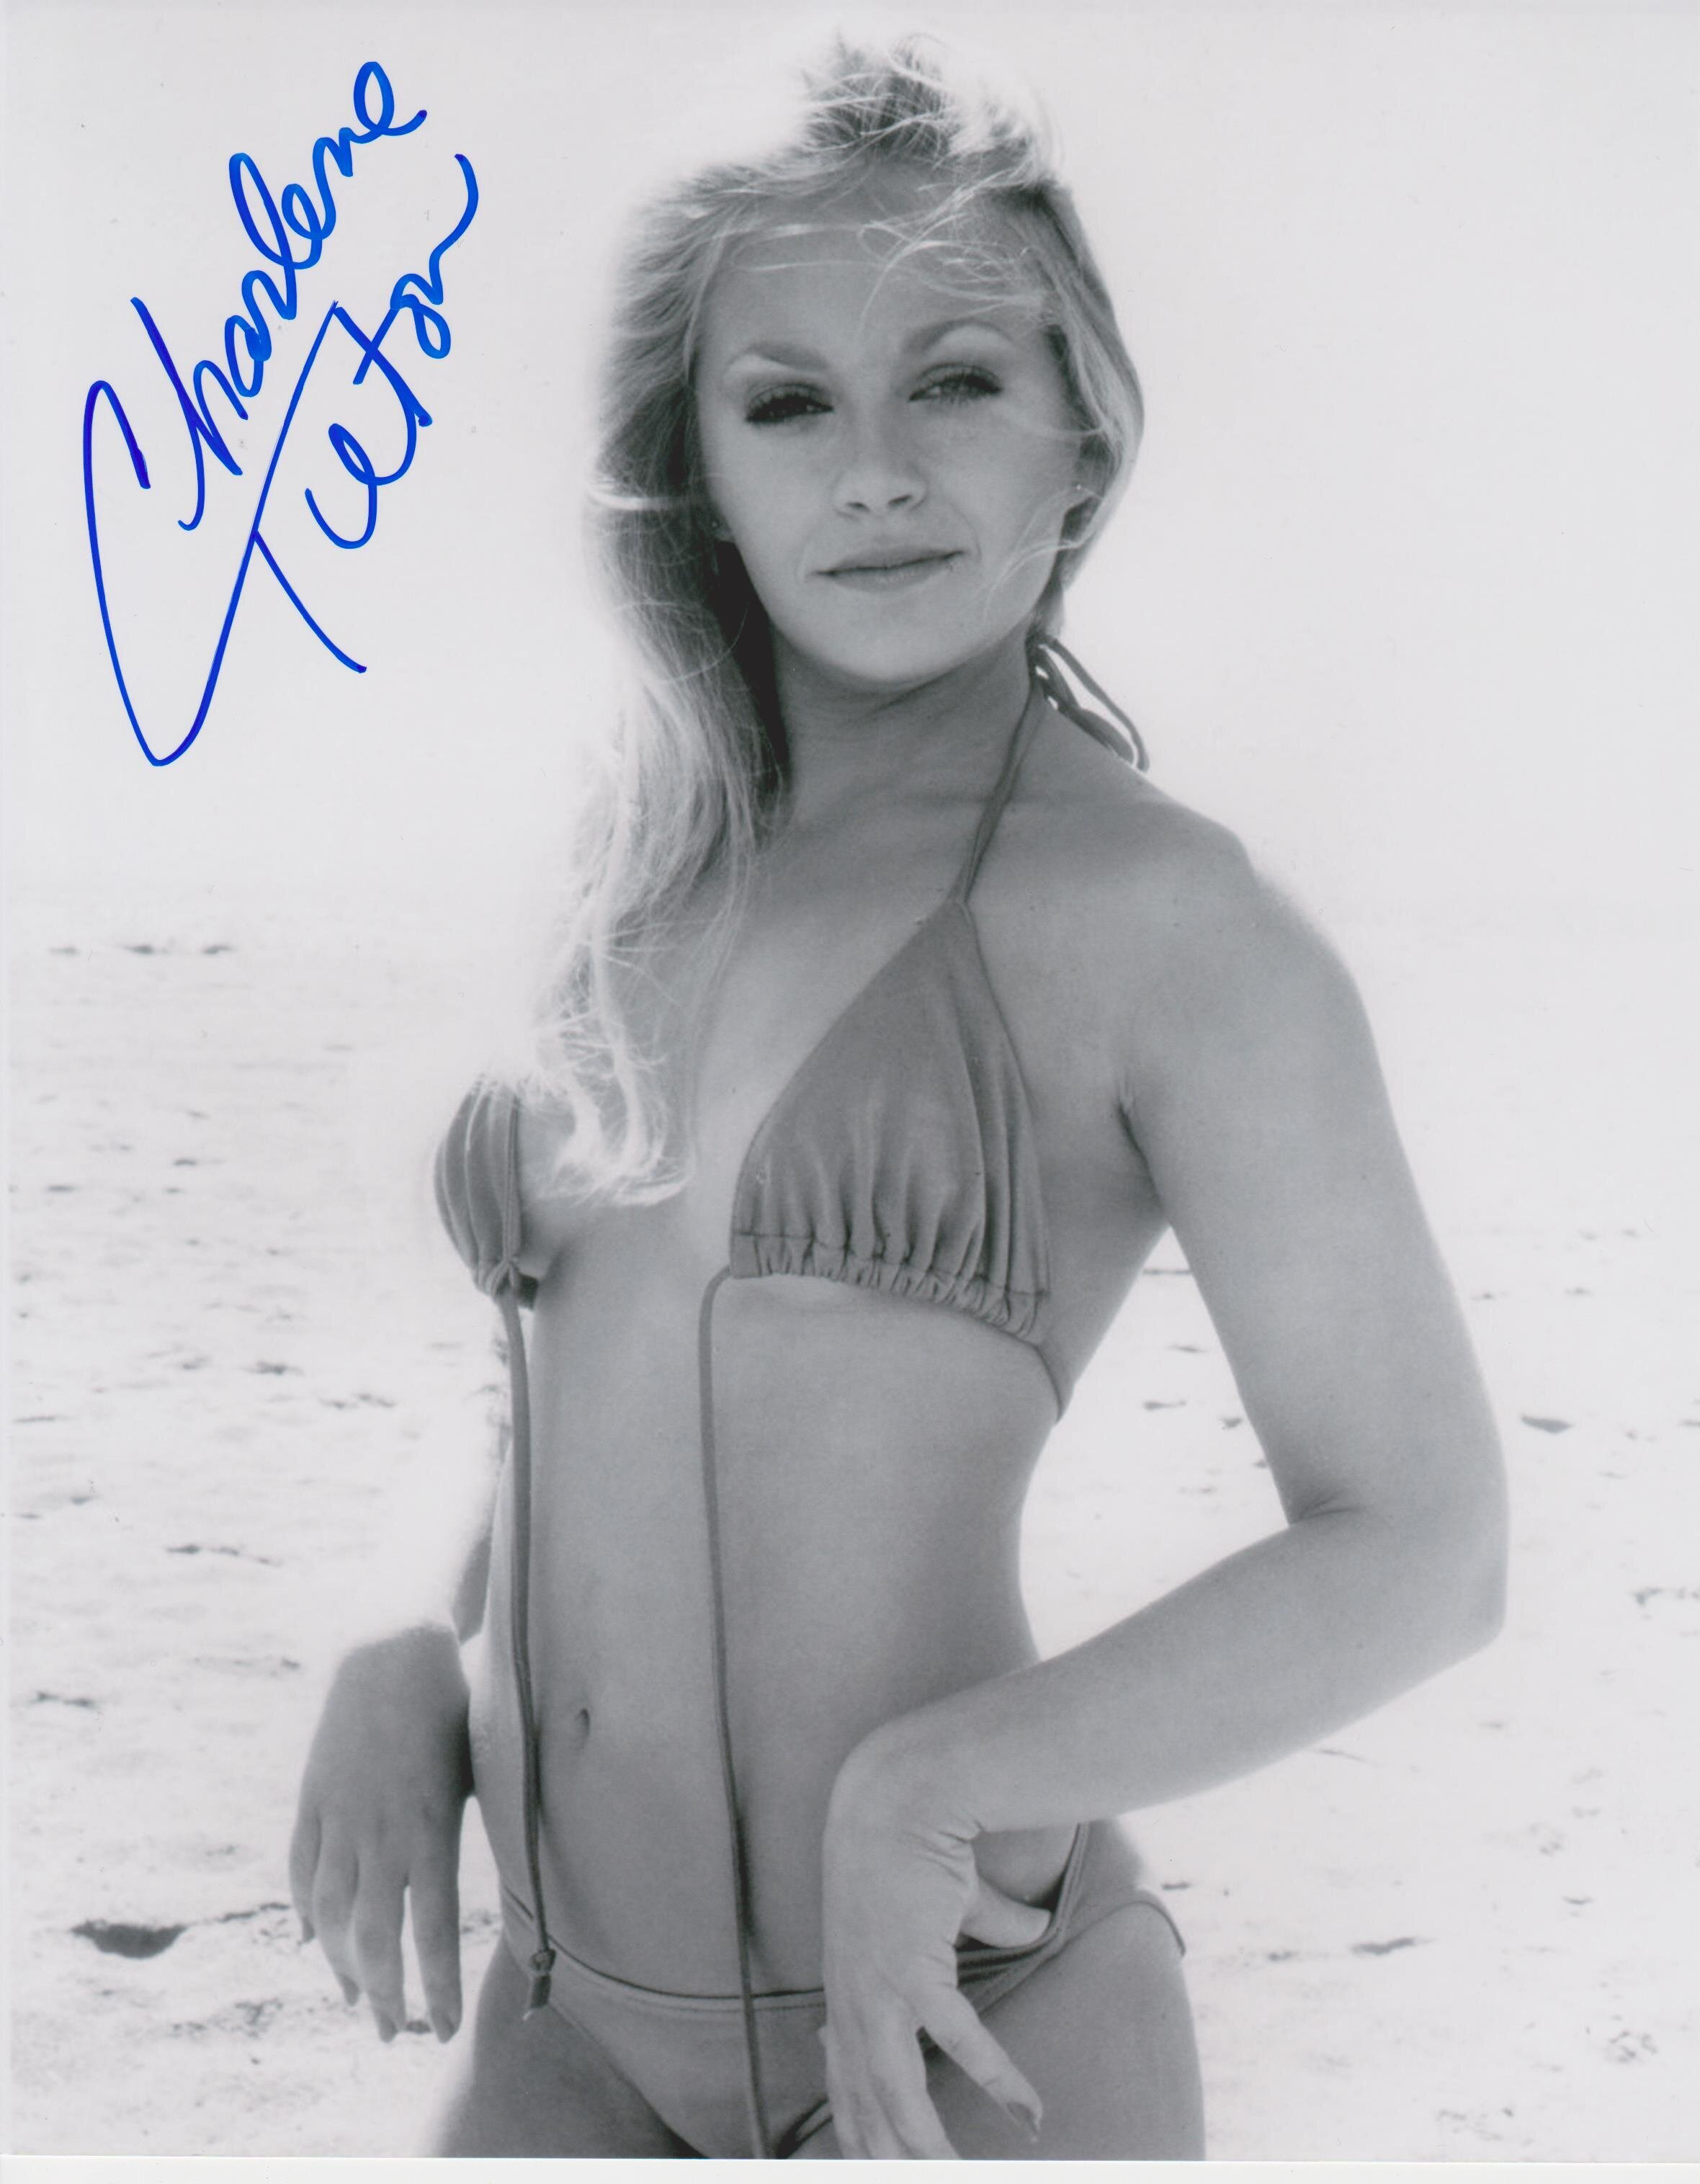 Communication on this topic: Yayo Aguila (b. 1967), helen-freeman-actress/